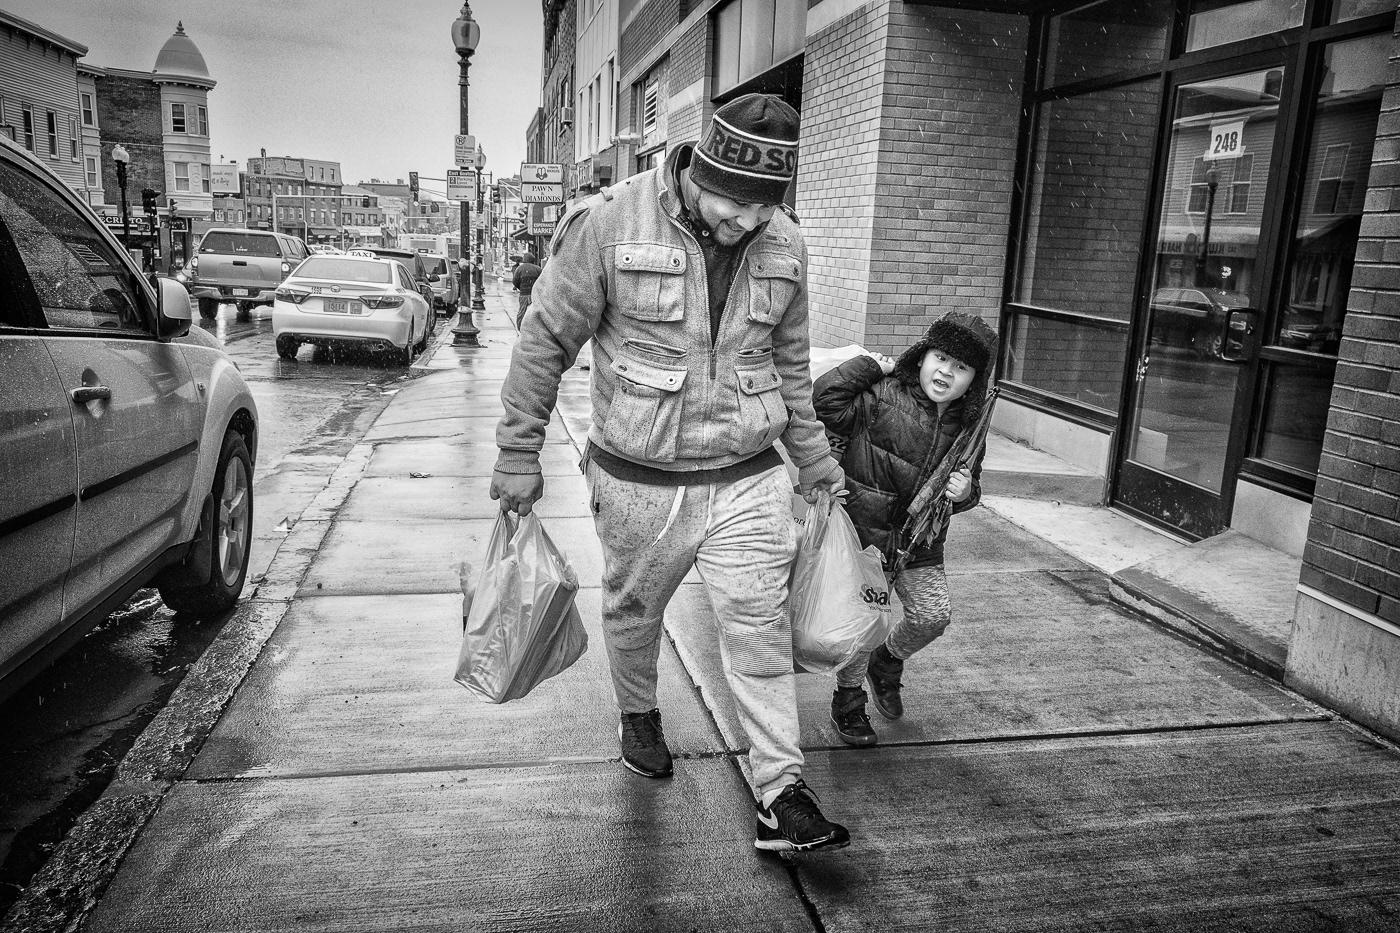 black and white bnw monochrome portrait PortraitPhotography Street streetphotography street photography photojournalism